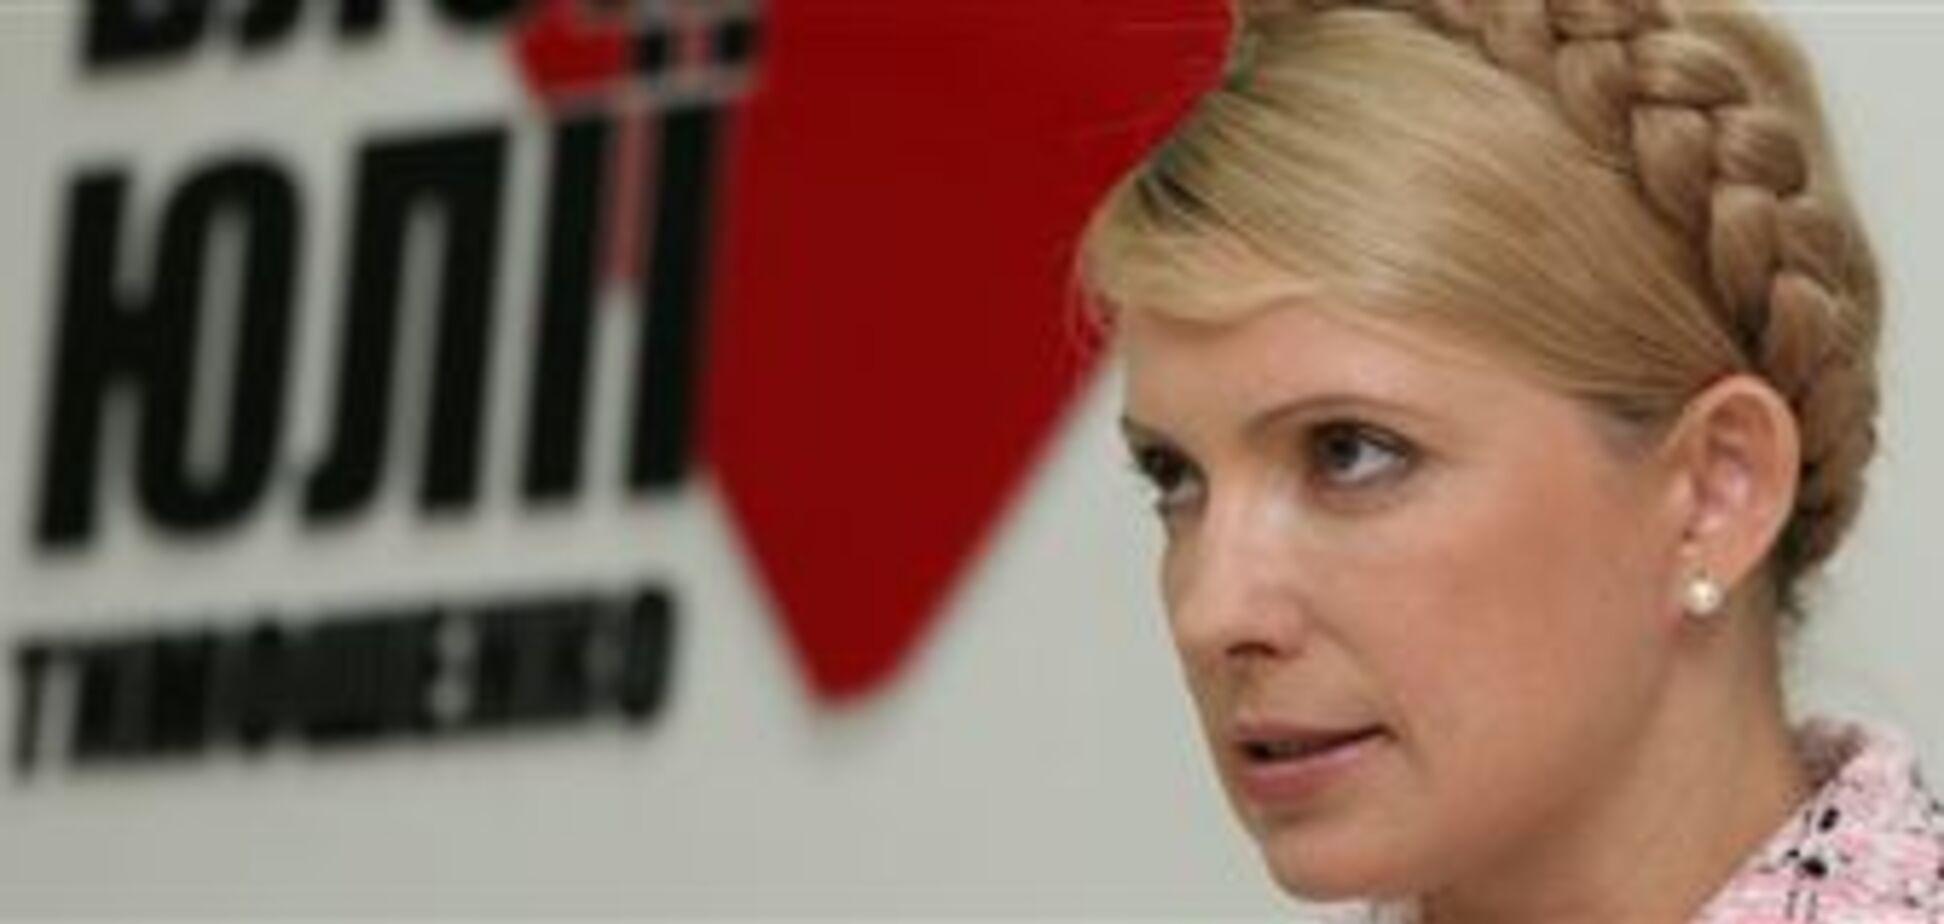 Черновецький наїхав на Тимошенко маршрутками